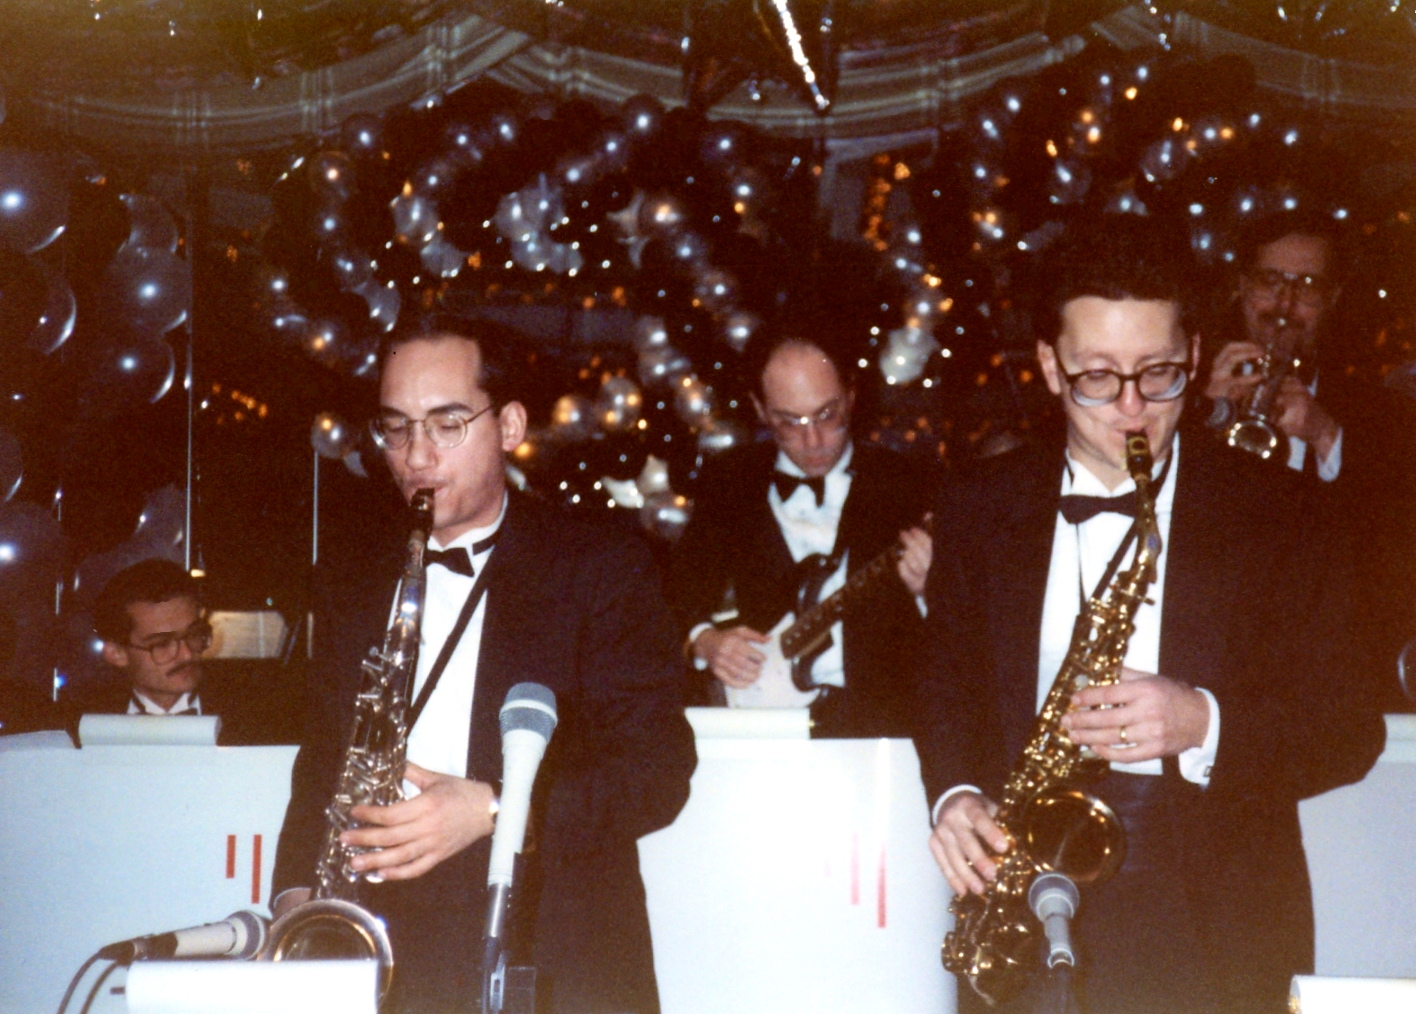 1991-12-31 HILTON (12).jpg